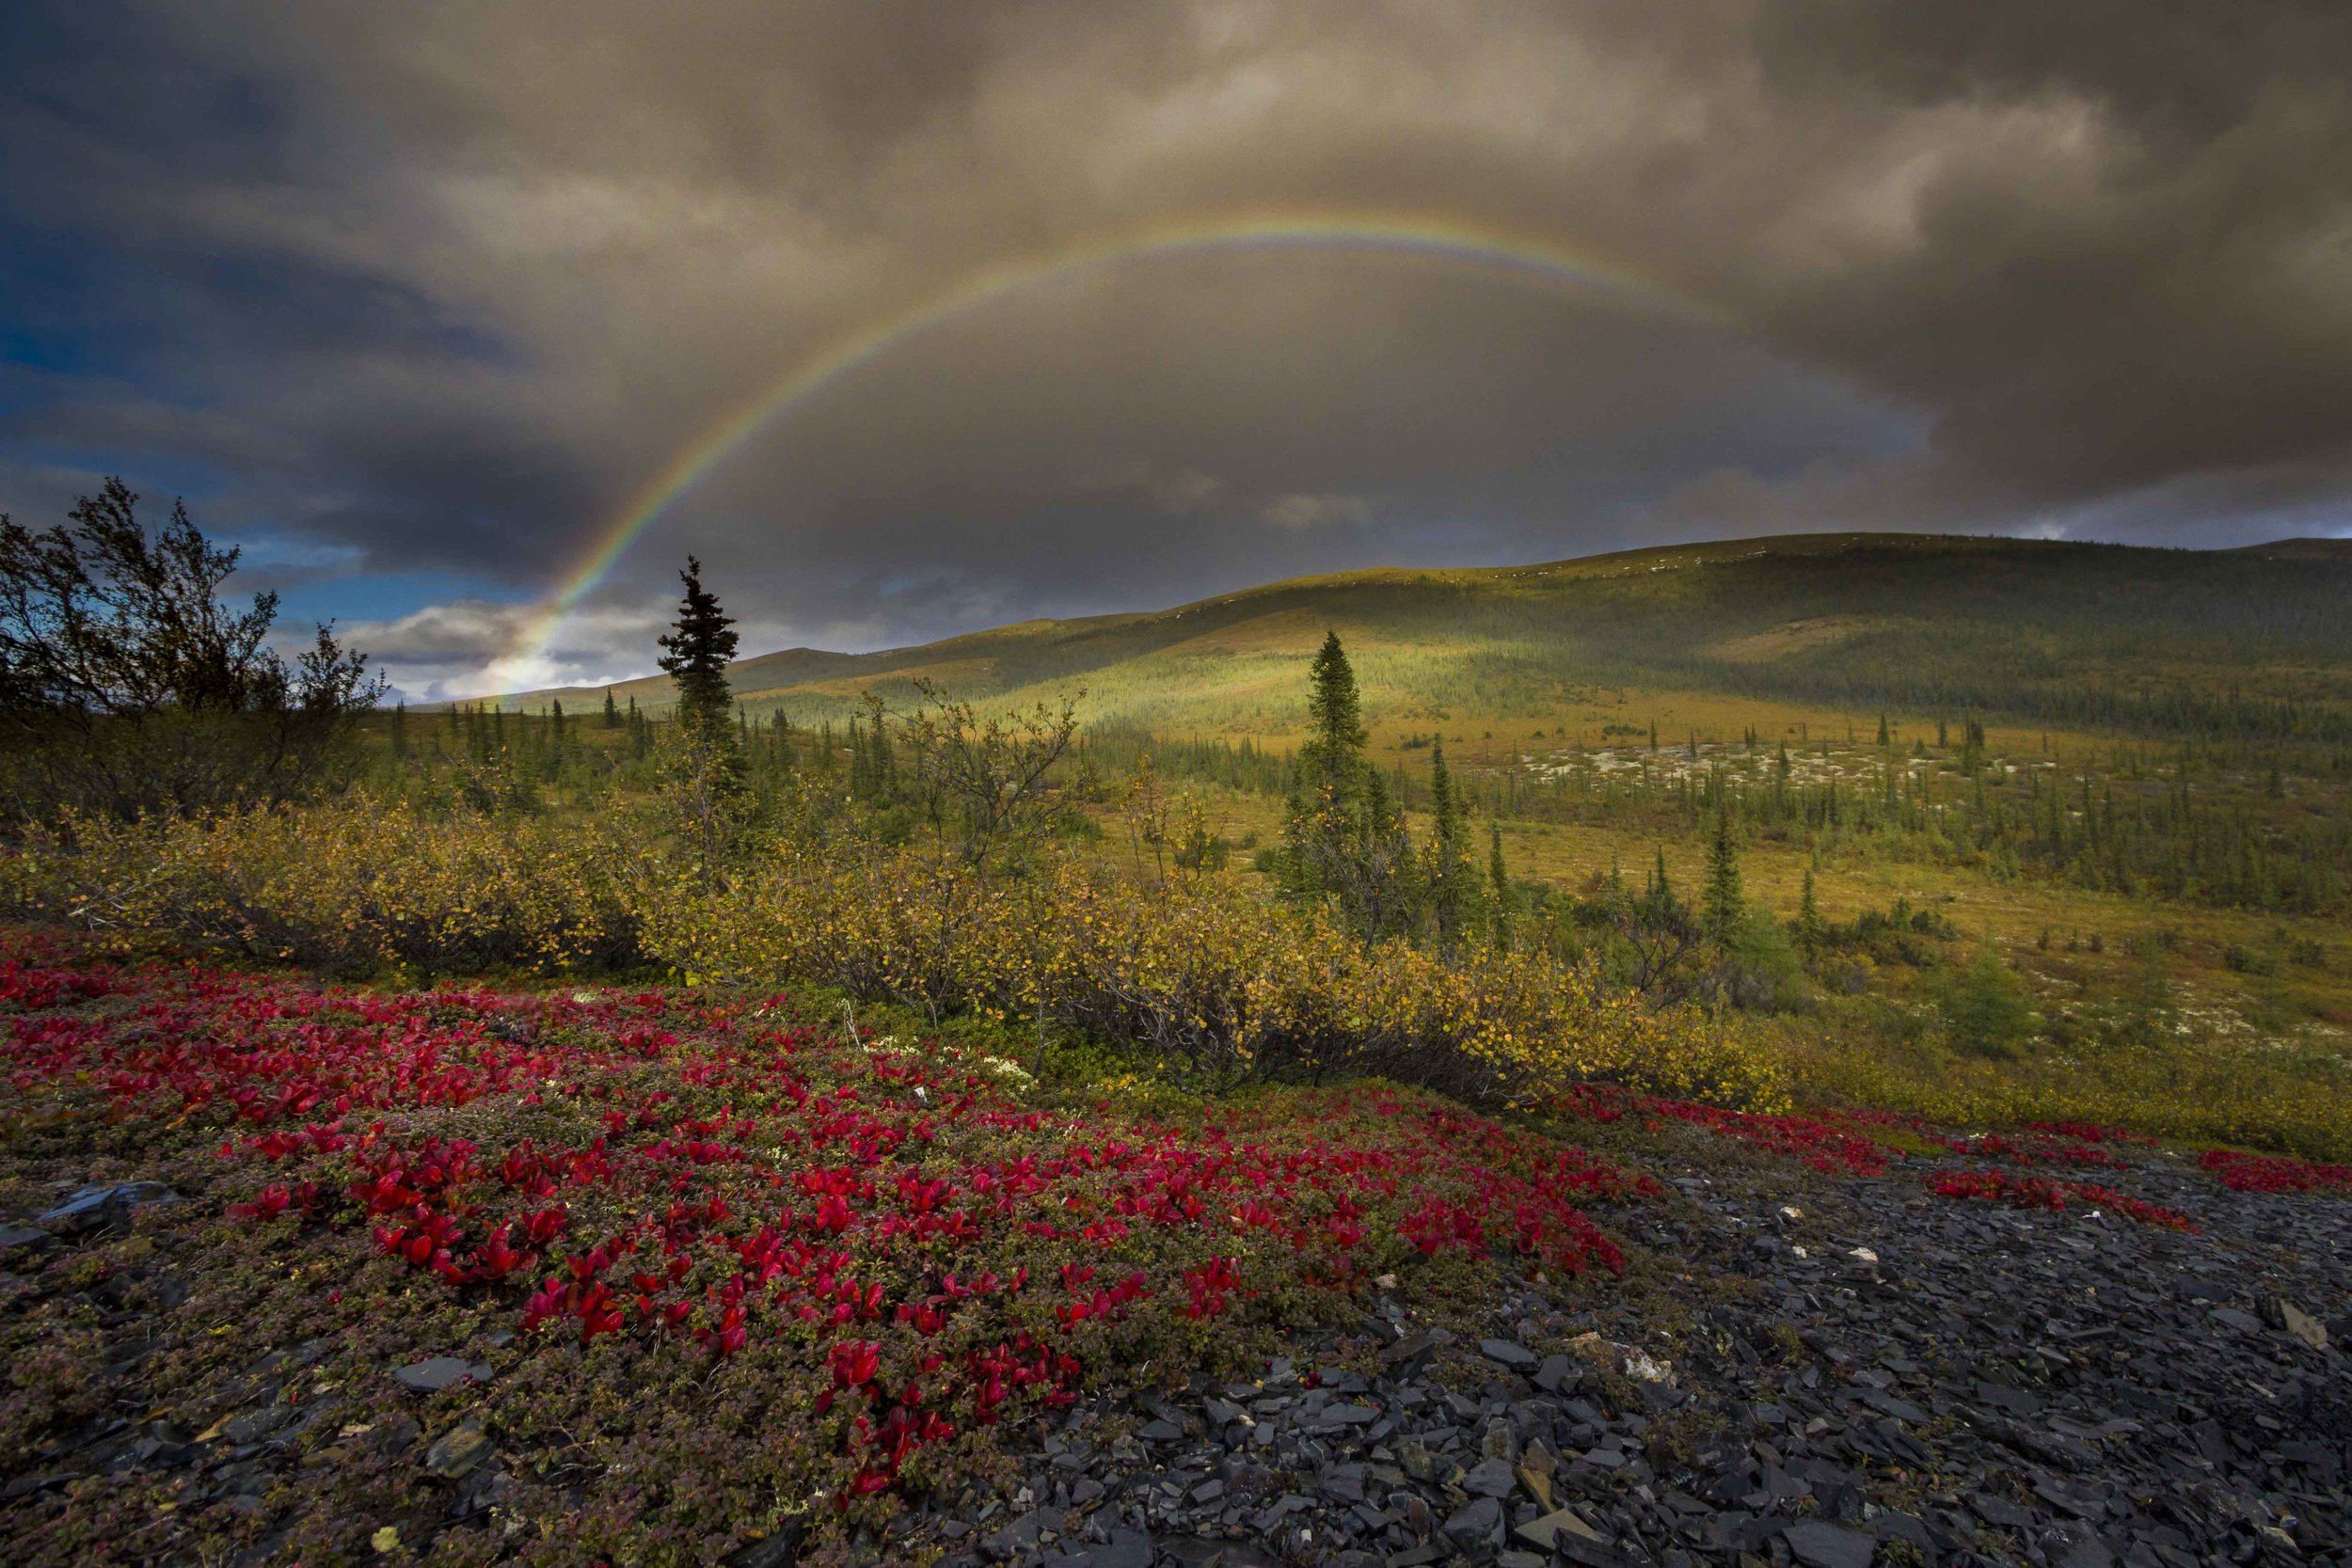 Dempster Highway, Roadtrip, Landscape, Arctic, rob gubiani, Tundra, Tombstone, Tuktoyuktuk, Inuvik, Dempster, Yukon, travel, wanderlust, rainbow